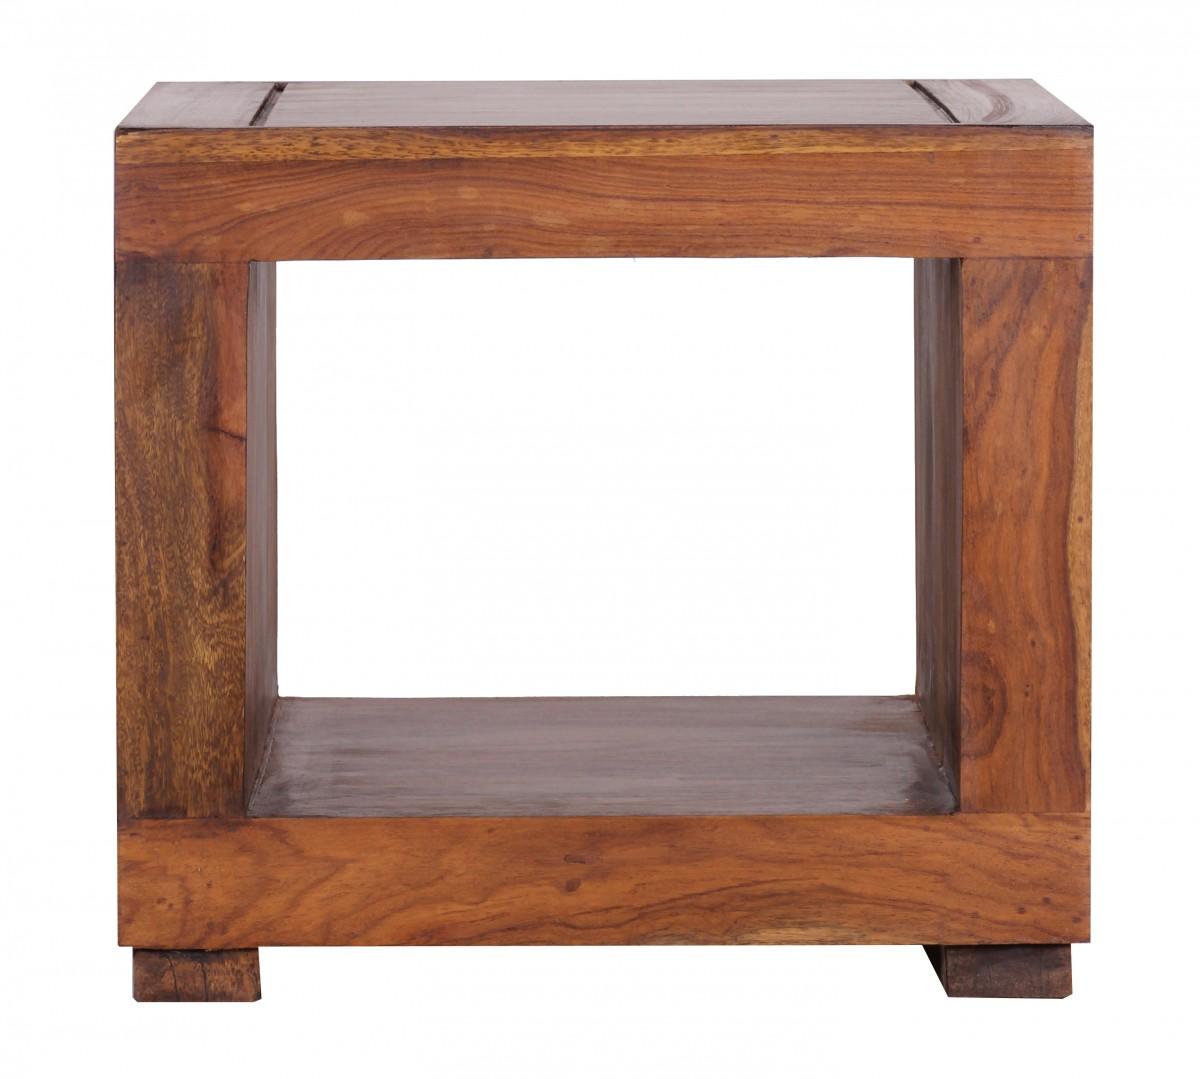 heipei 417831 tisch arno gestell und platte kunststoff gr e ca 50 x 50 cm h he ca 65 cm. Black Bedroom Furniture Sets. Home Design Ideas